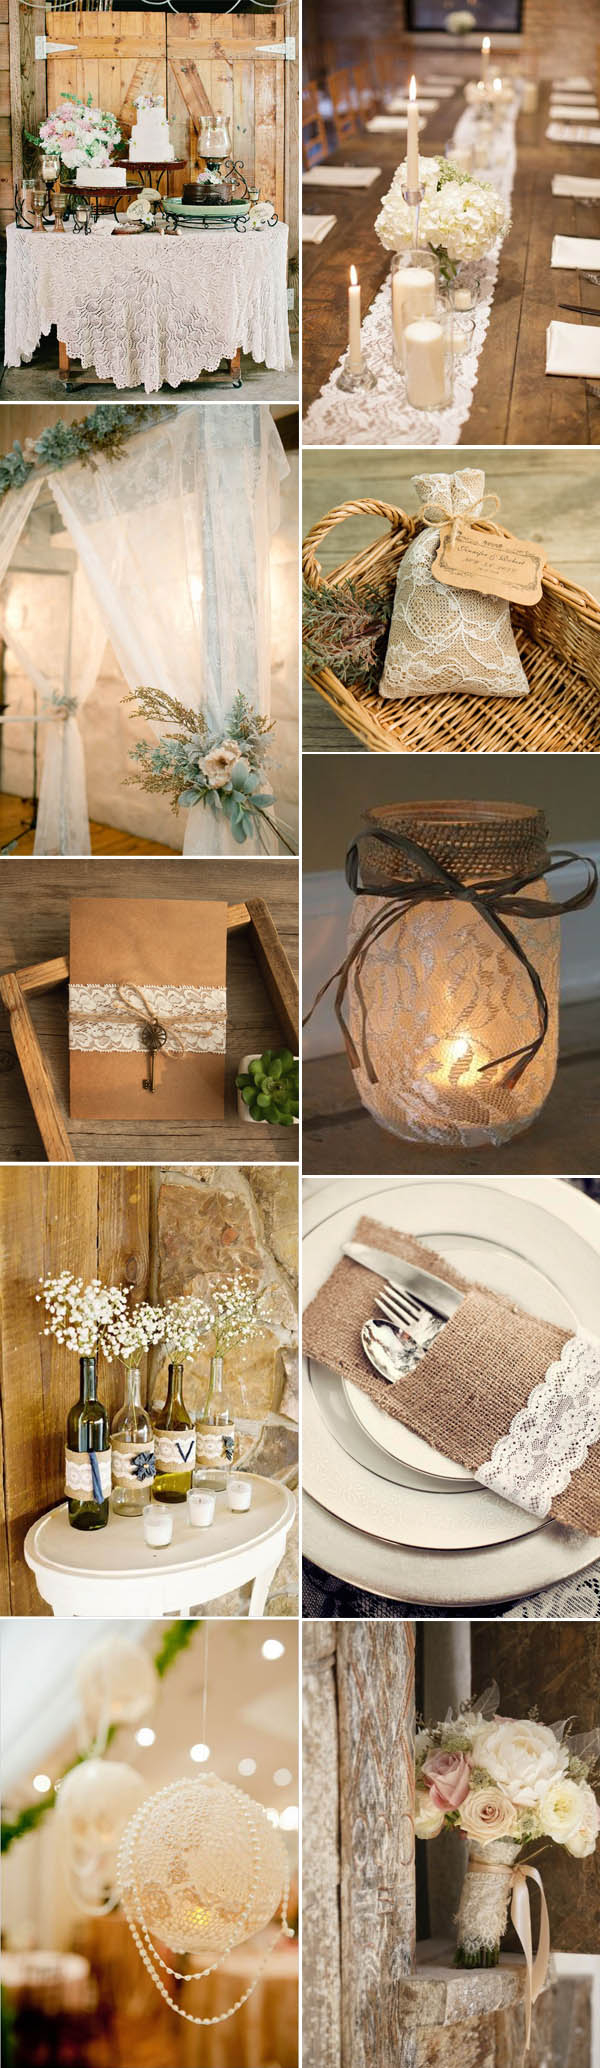 Vintage Wedding Ideas 28 Of The Most Inspirational Vintage Wedding Ideas